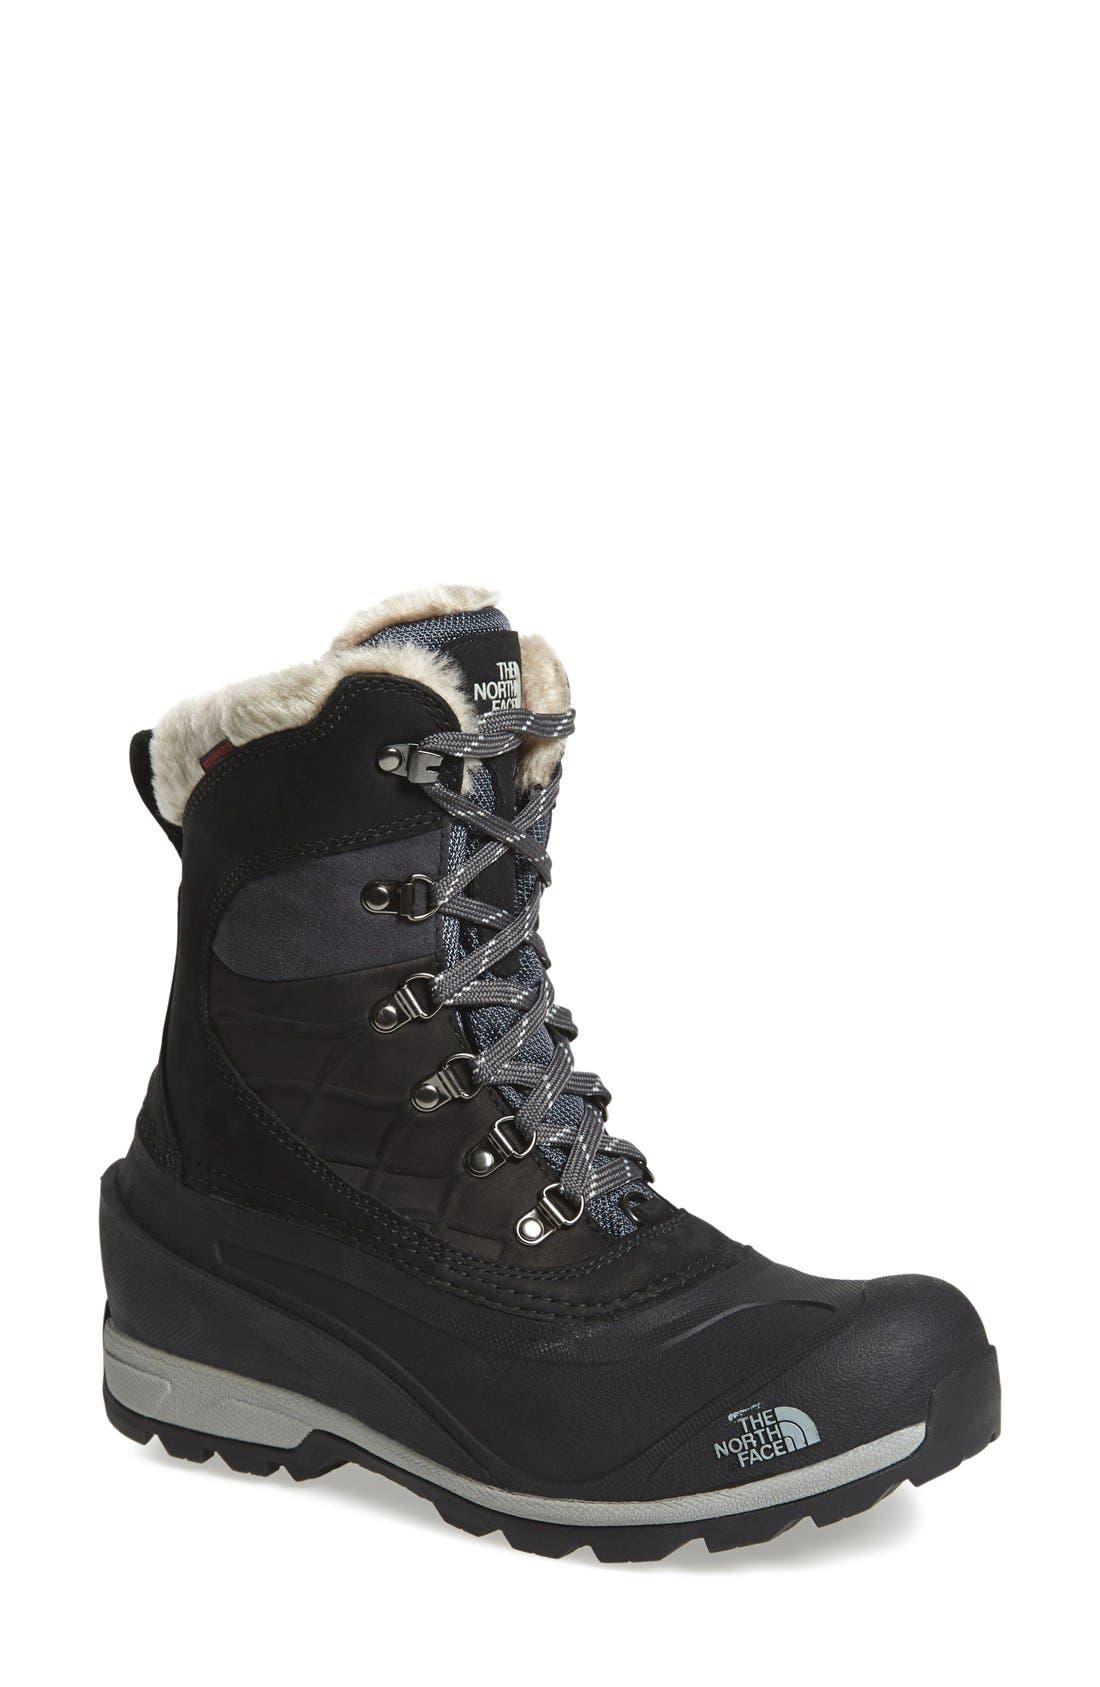 'Chilkat 400' Waterproof PrimaLoft<sup>®</sup> Insulated Boot,                             Main thumbnail 2, color,